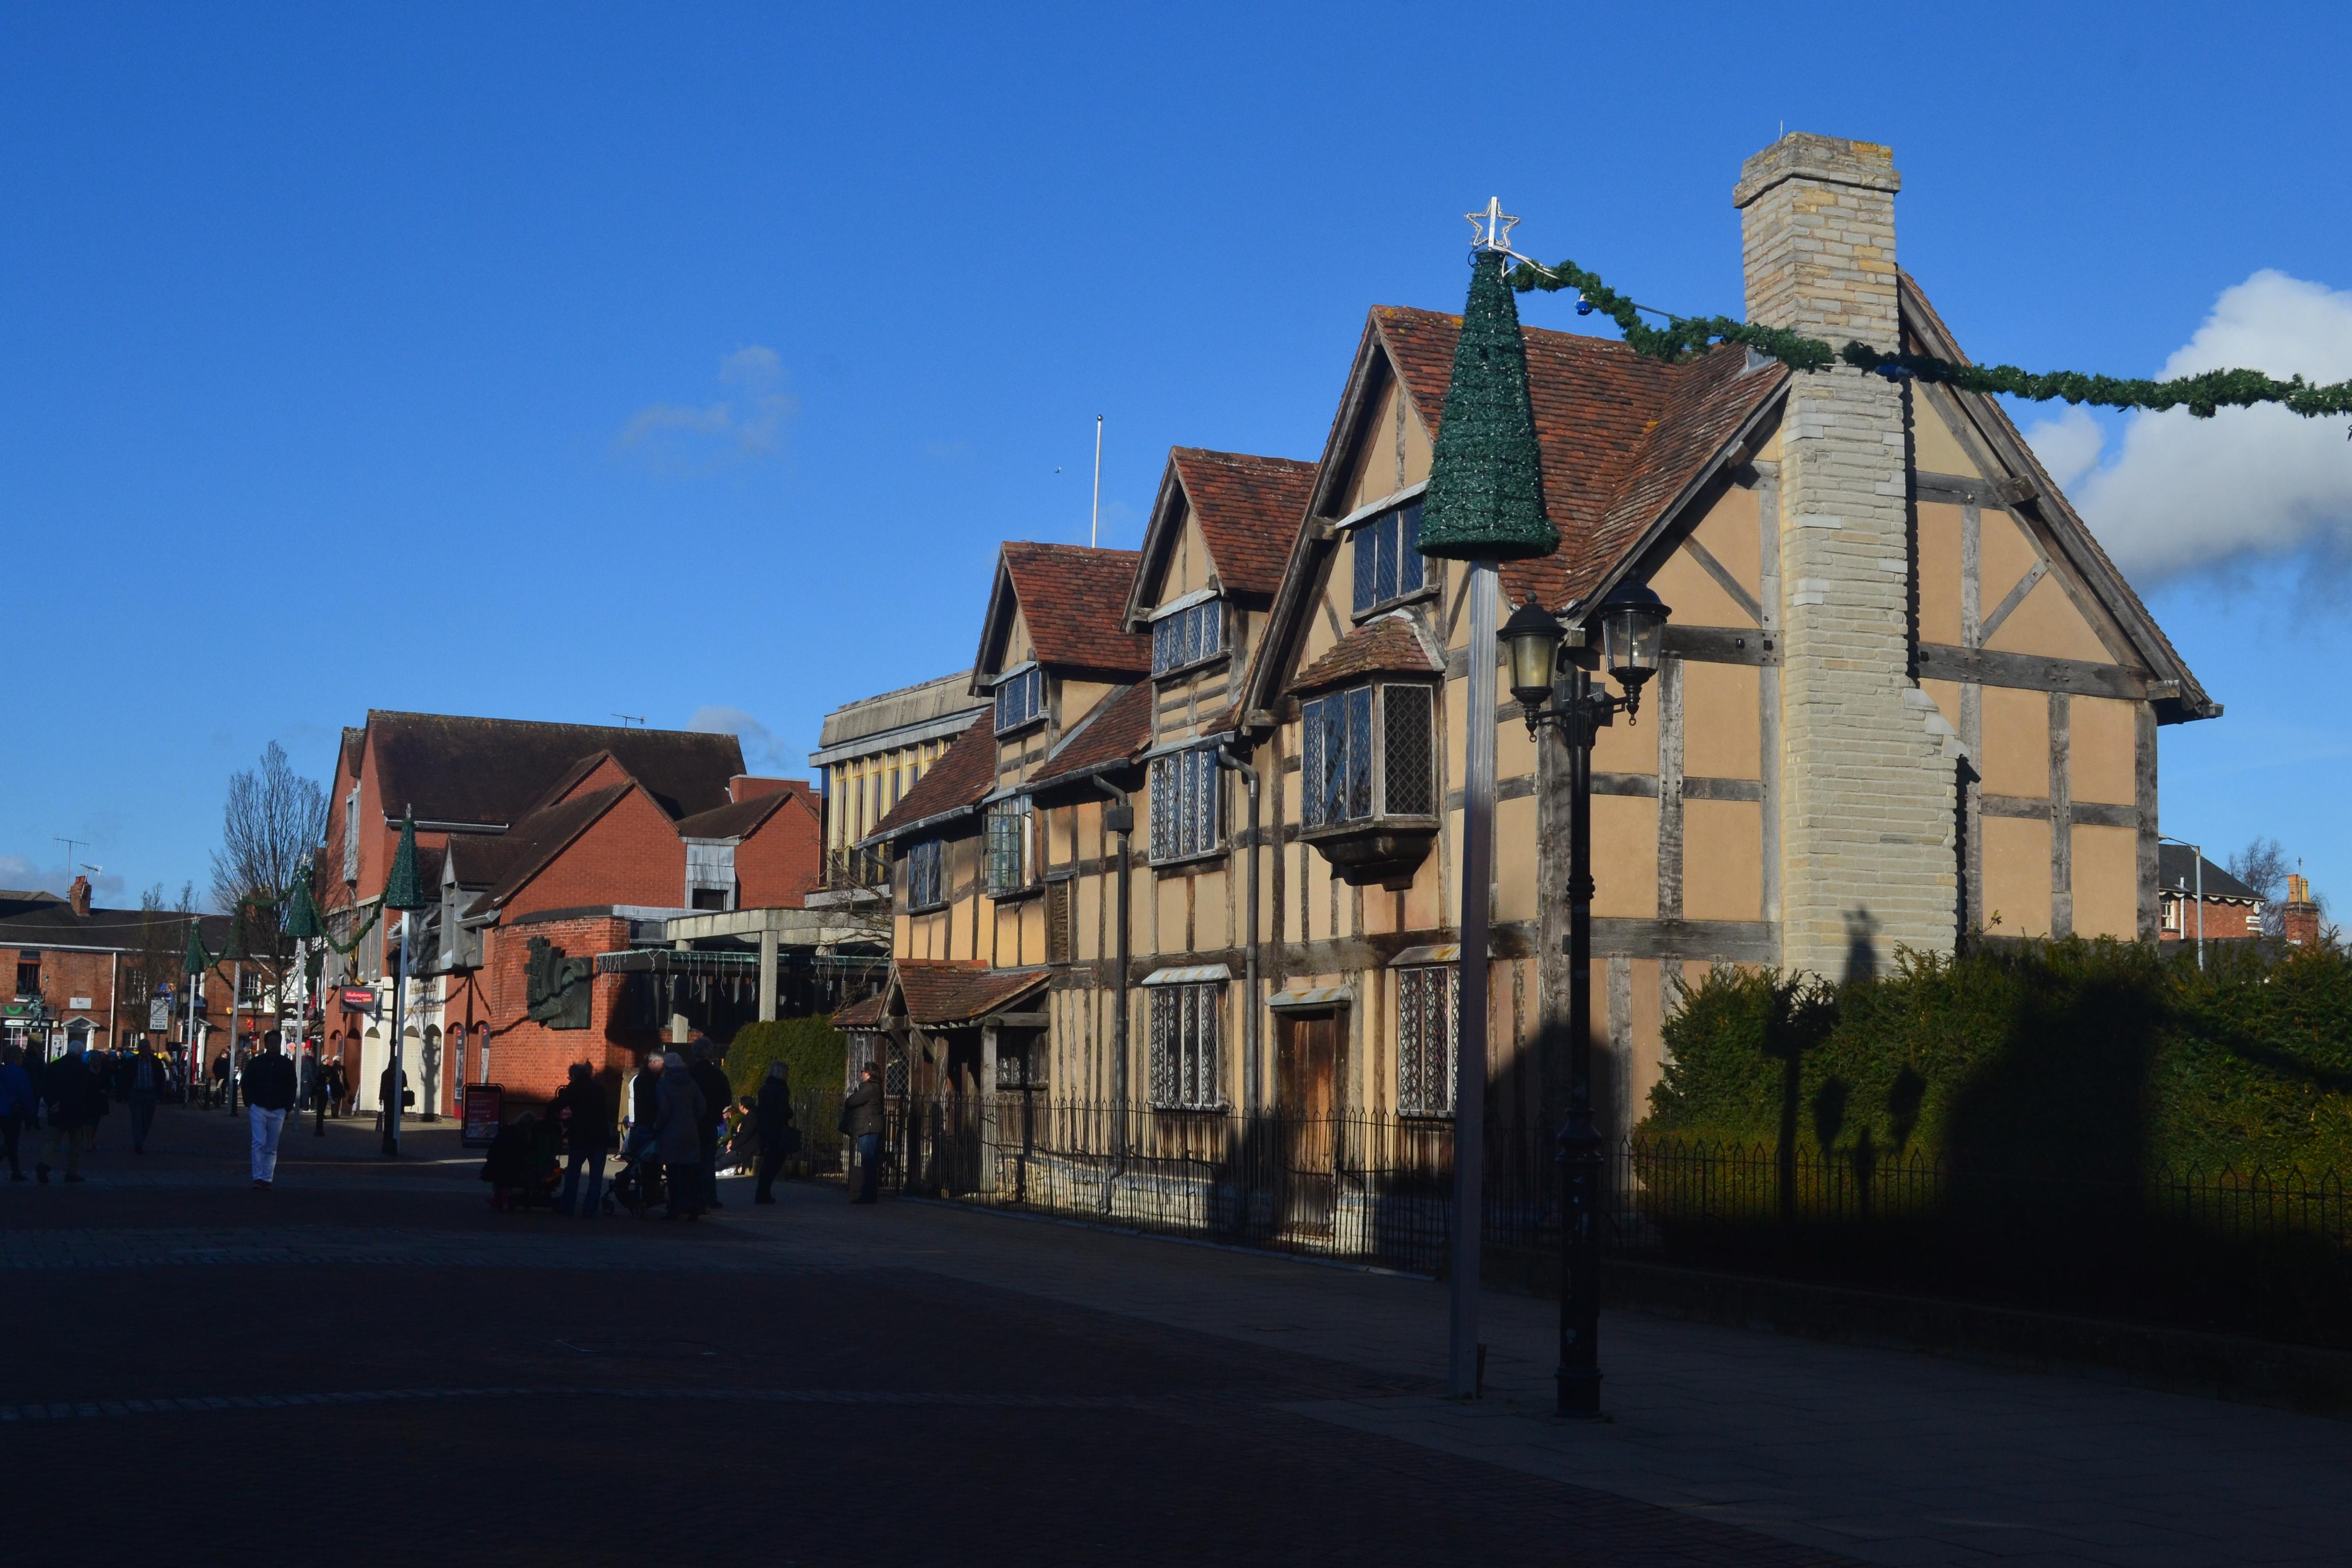 Shakespeares Birthplace Henley Street Stratford Upon Avon